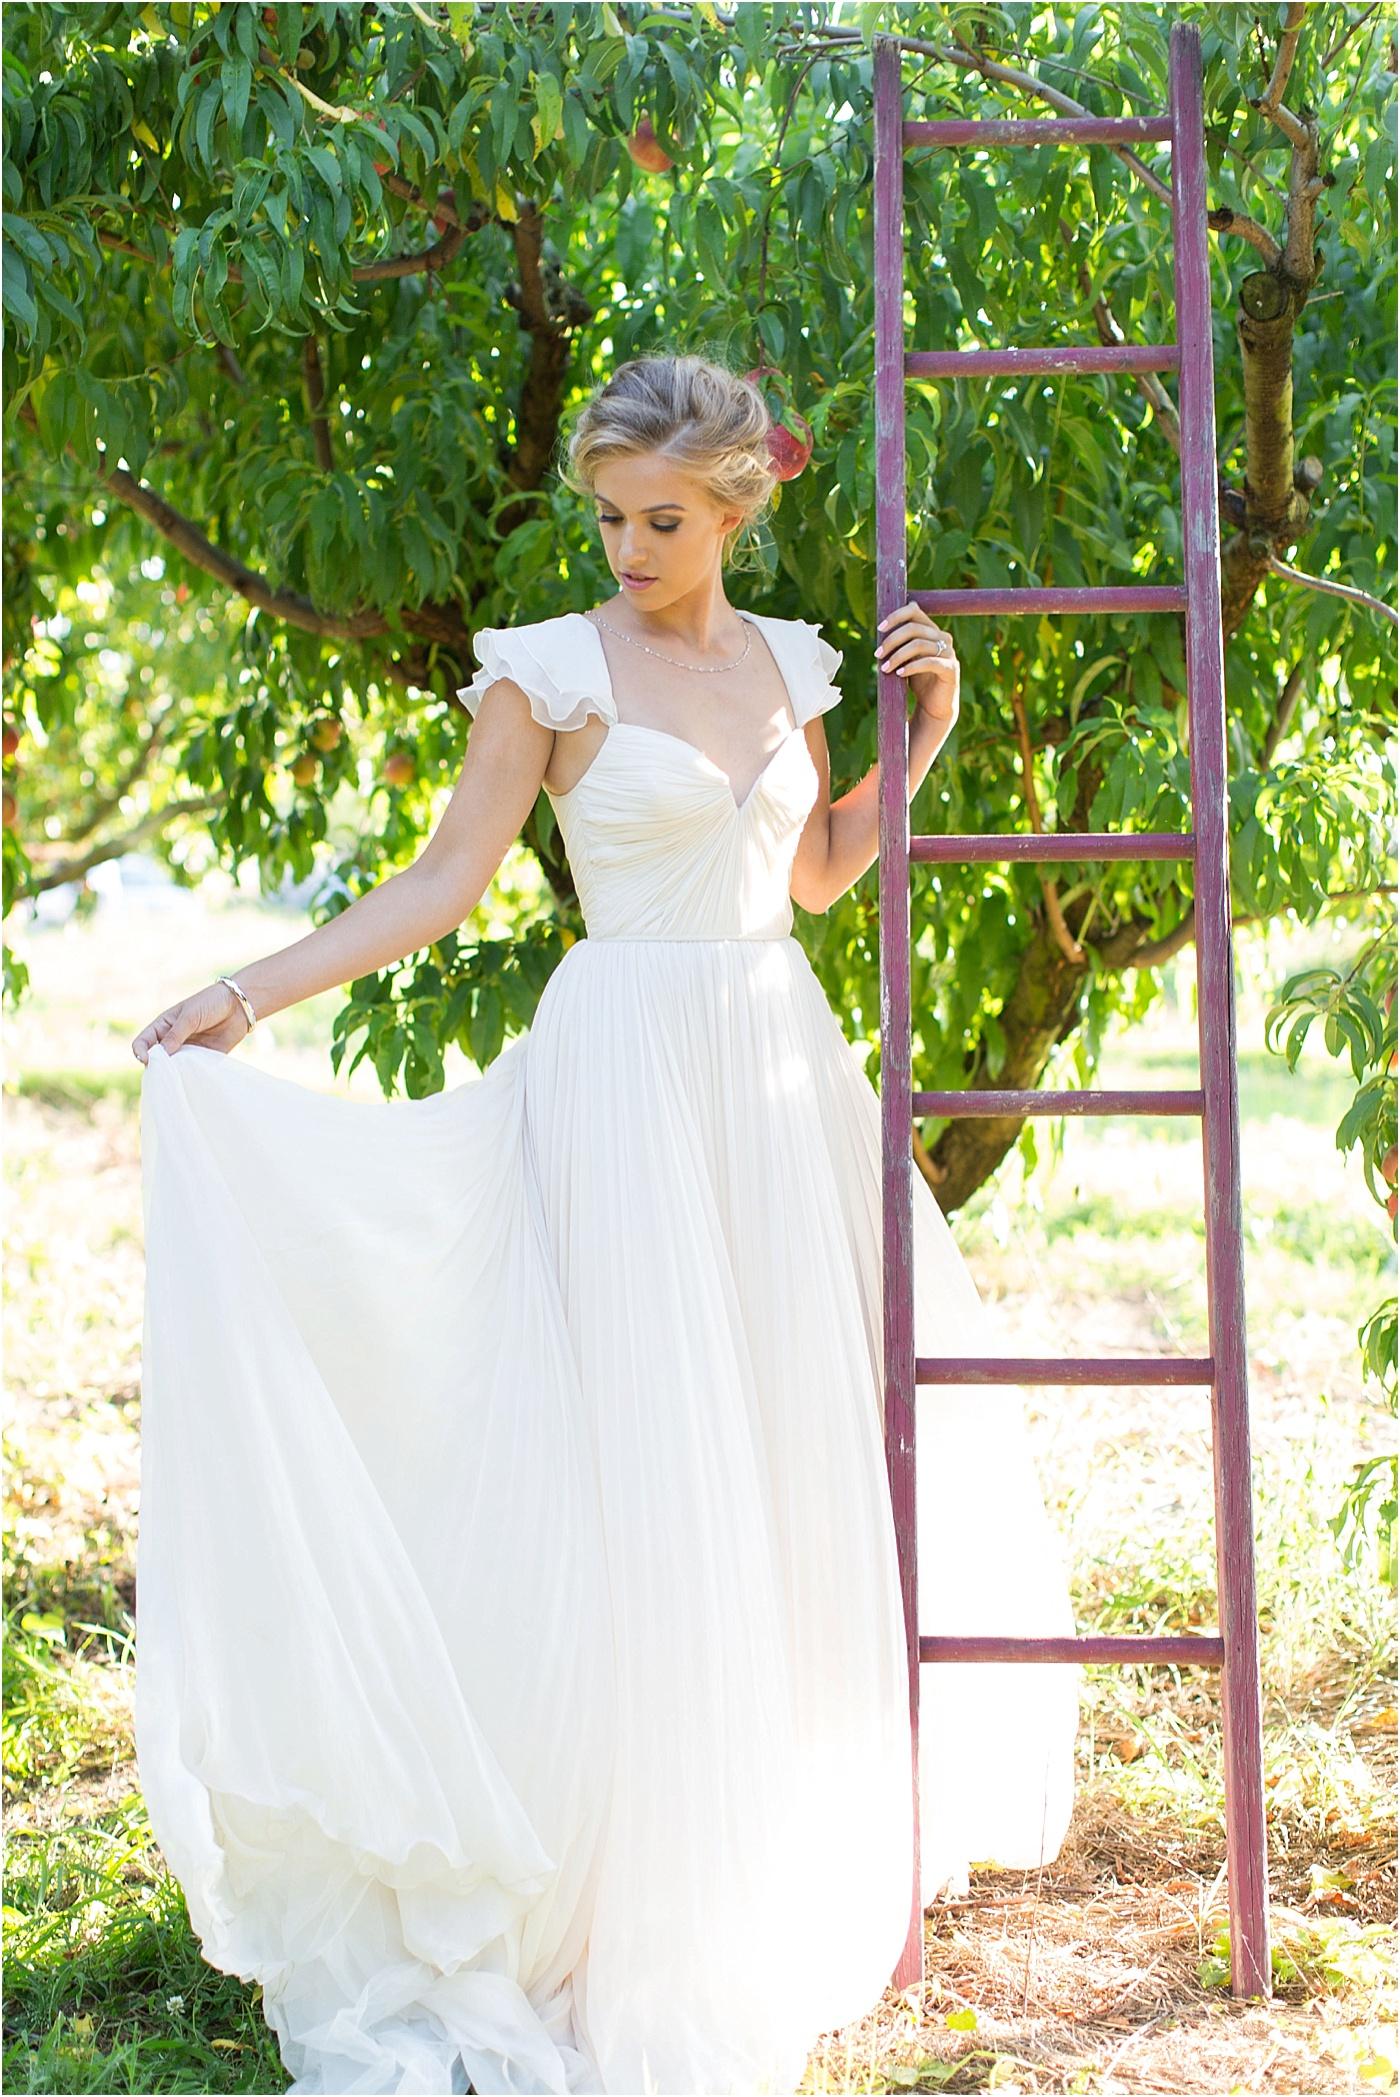 Rustic Peach Orchard Wedding Inspiration